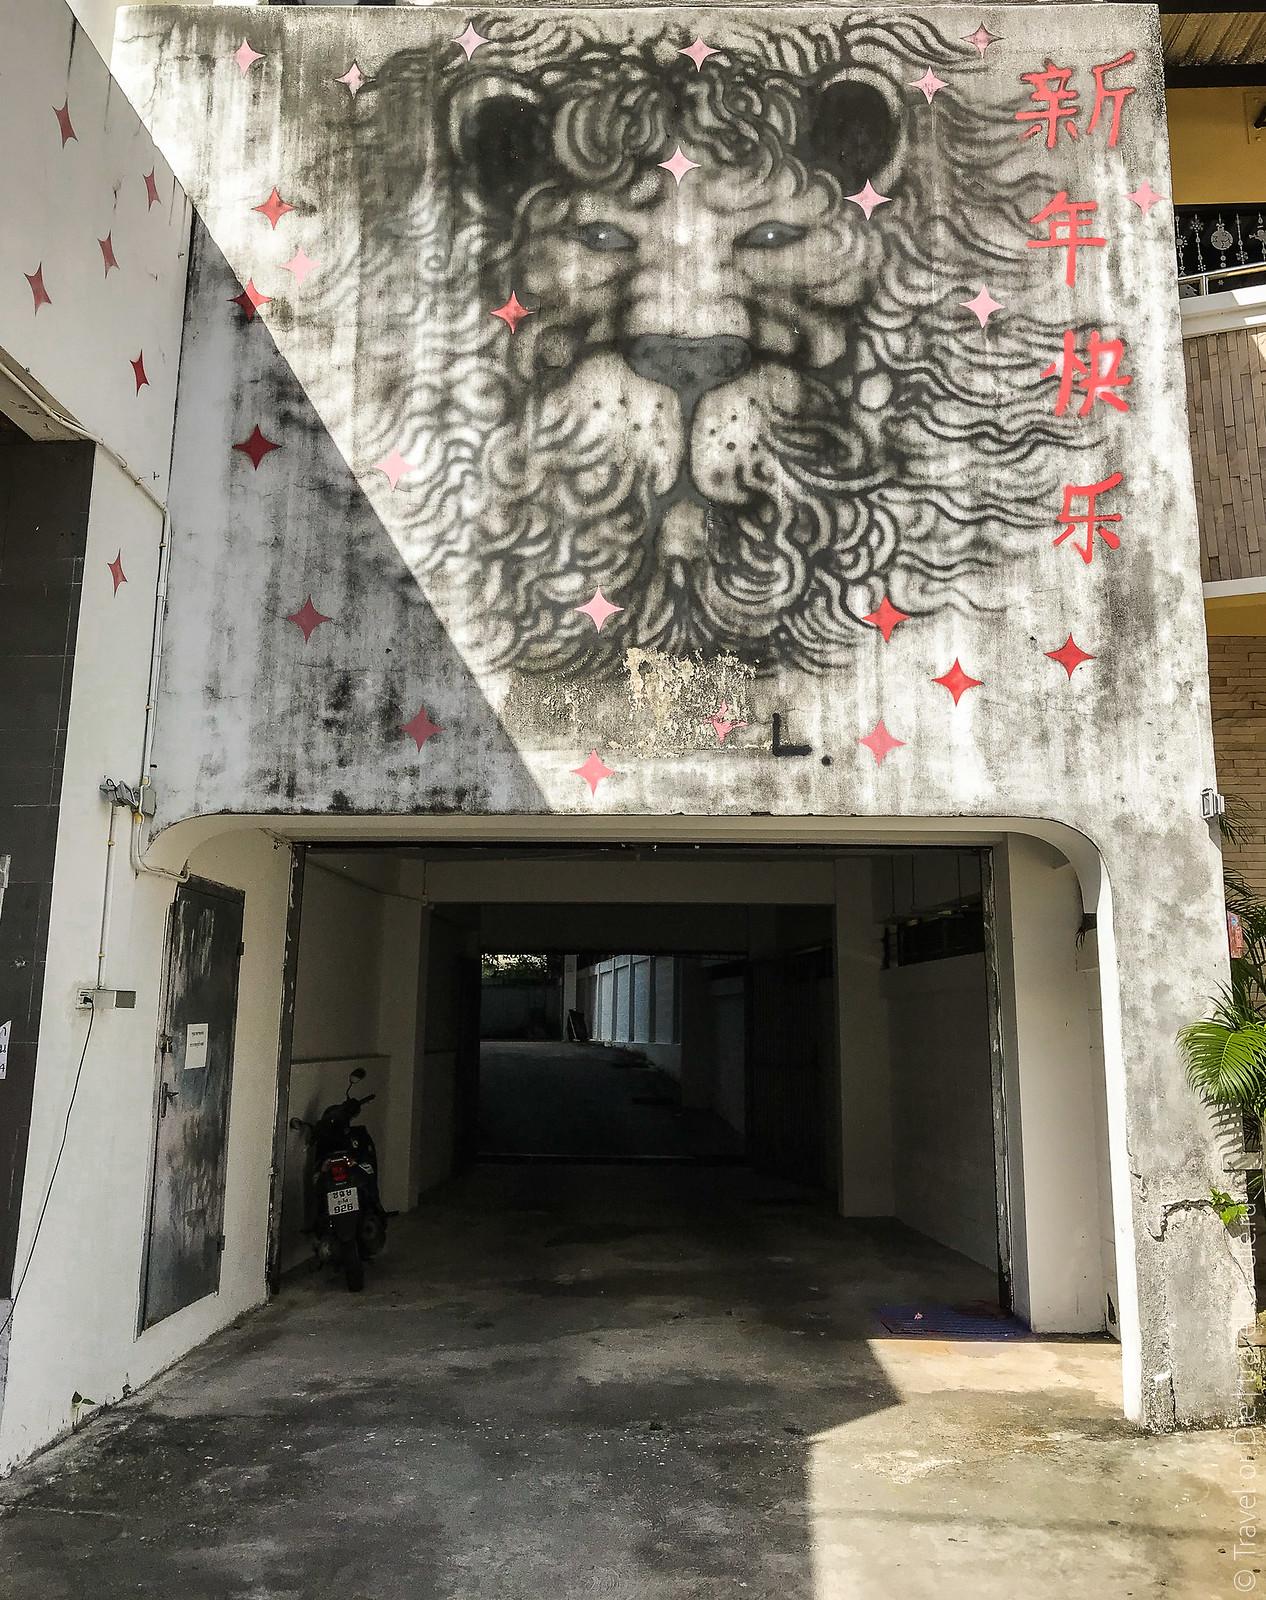 Phuket-Town-Old-Town-Thailand-3891